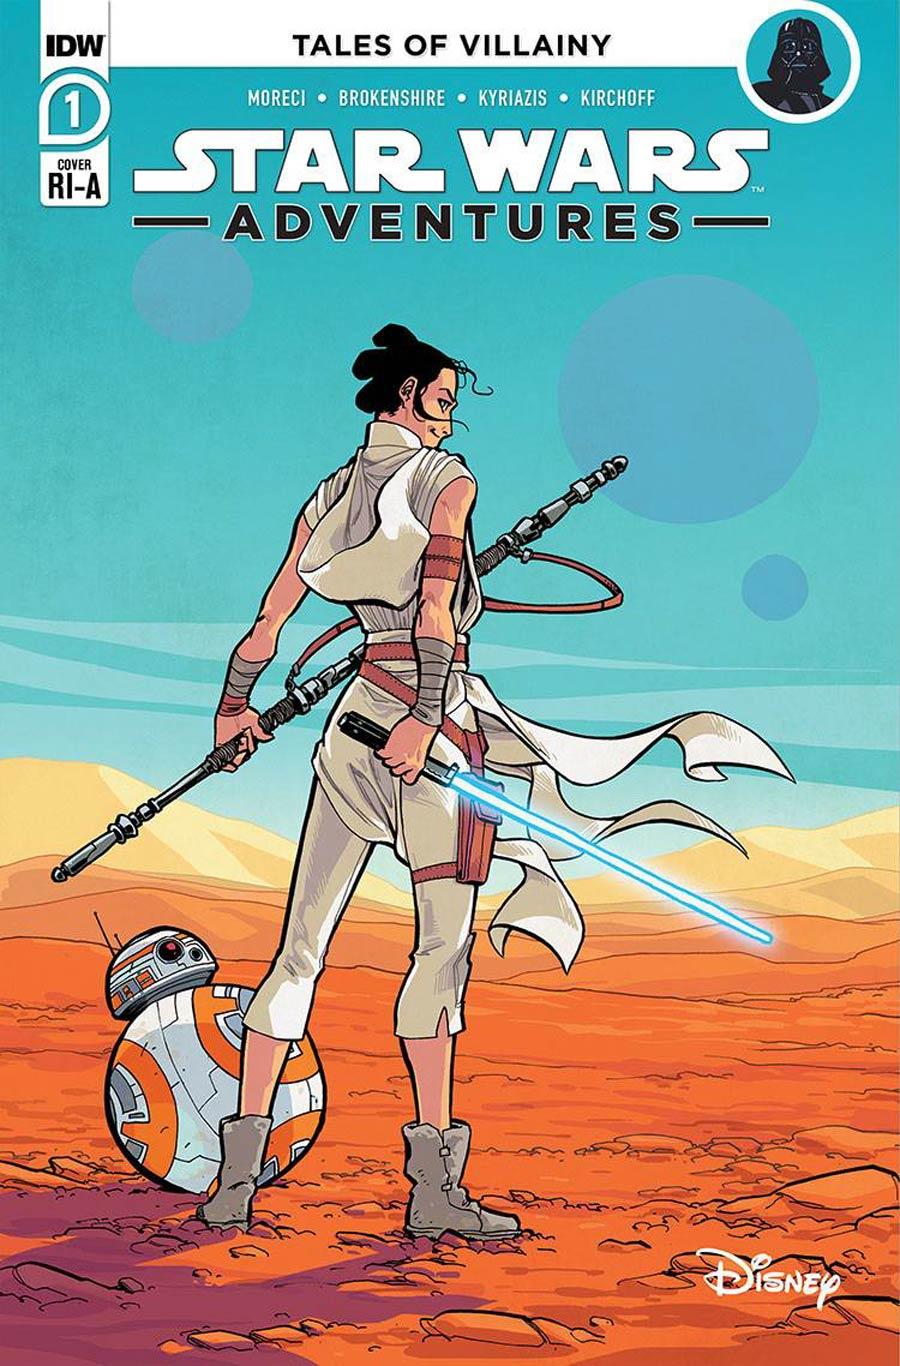 Star Wars Adventures Vol 2 #1 Cover C Incentive Ilias Kyriazis Variant Cover